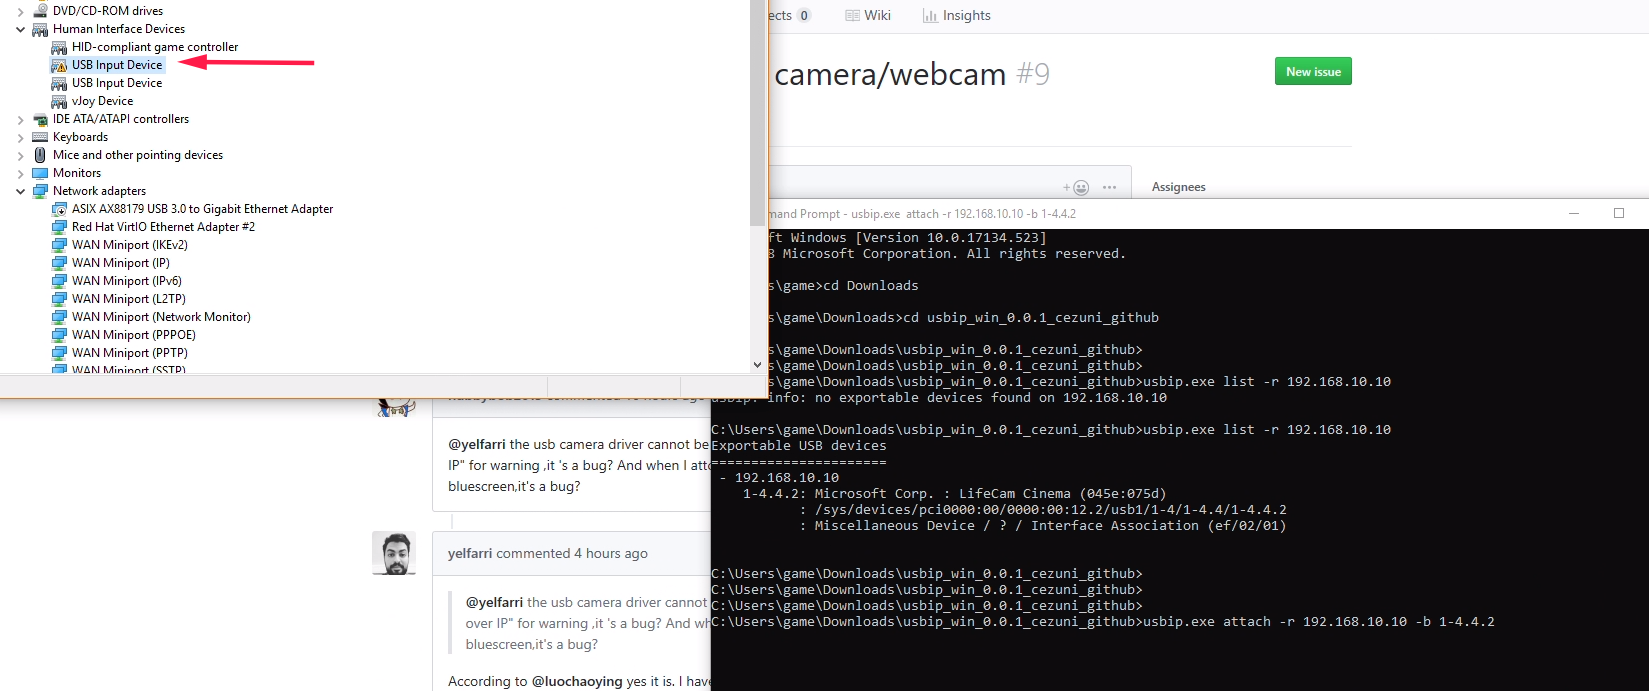 uvc (USB video device class) camera/webcam · Issue #9